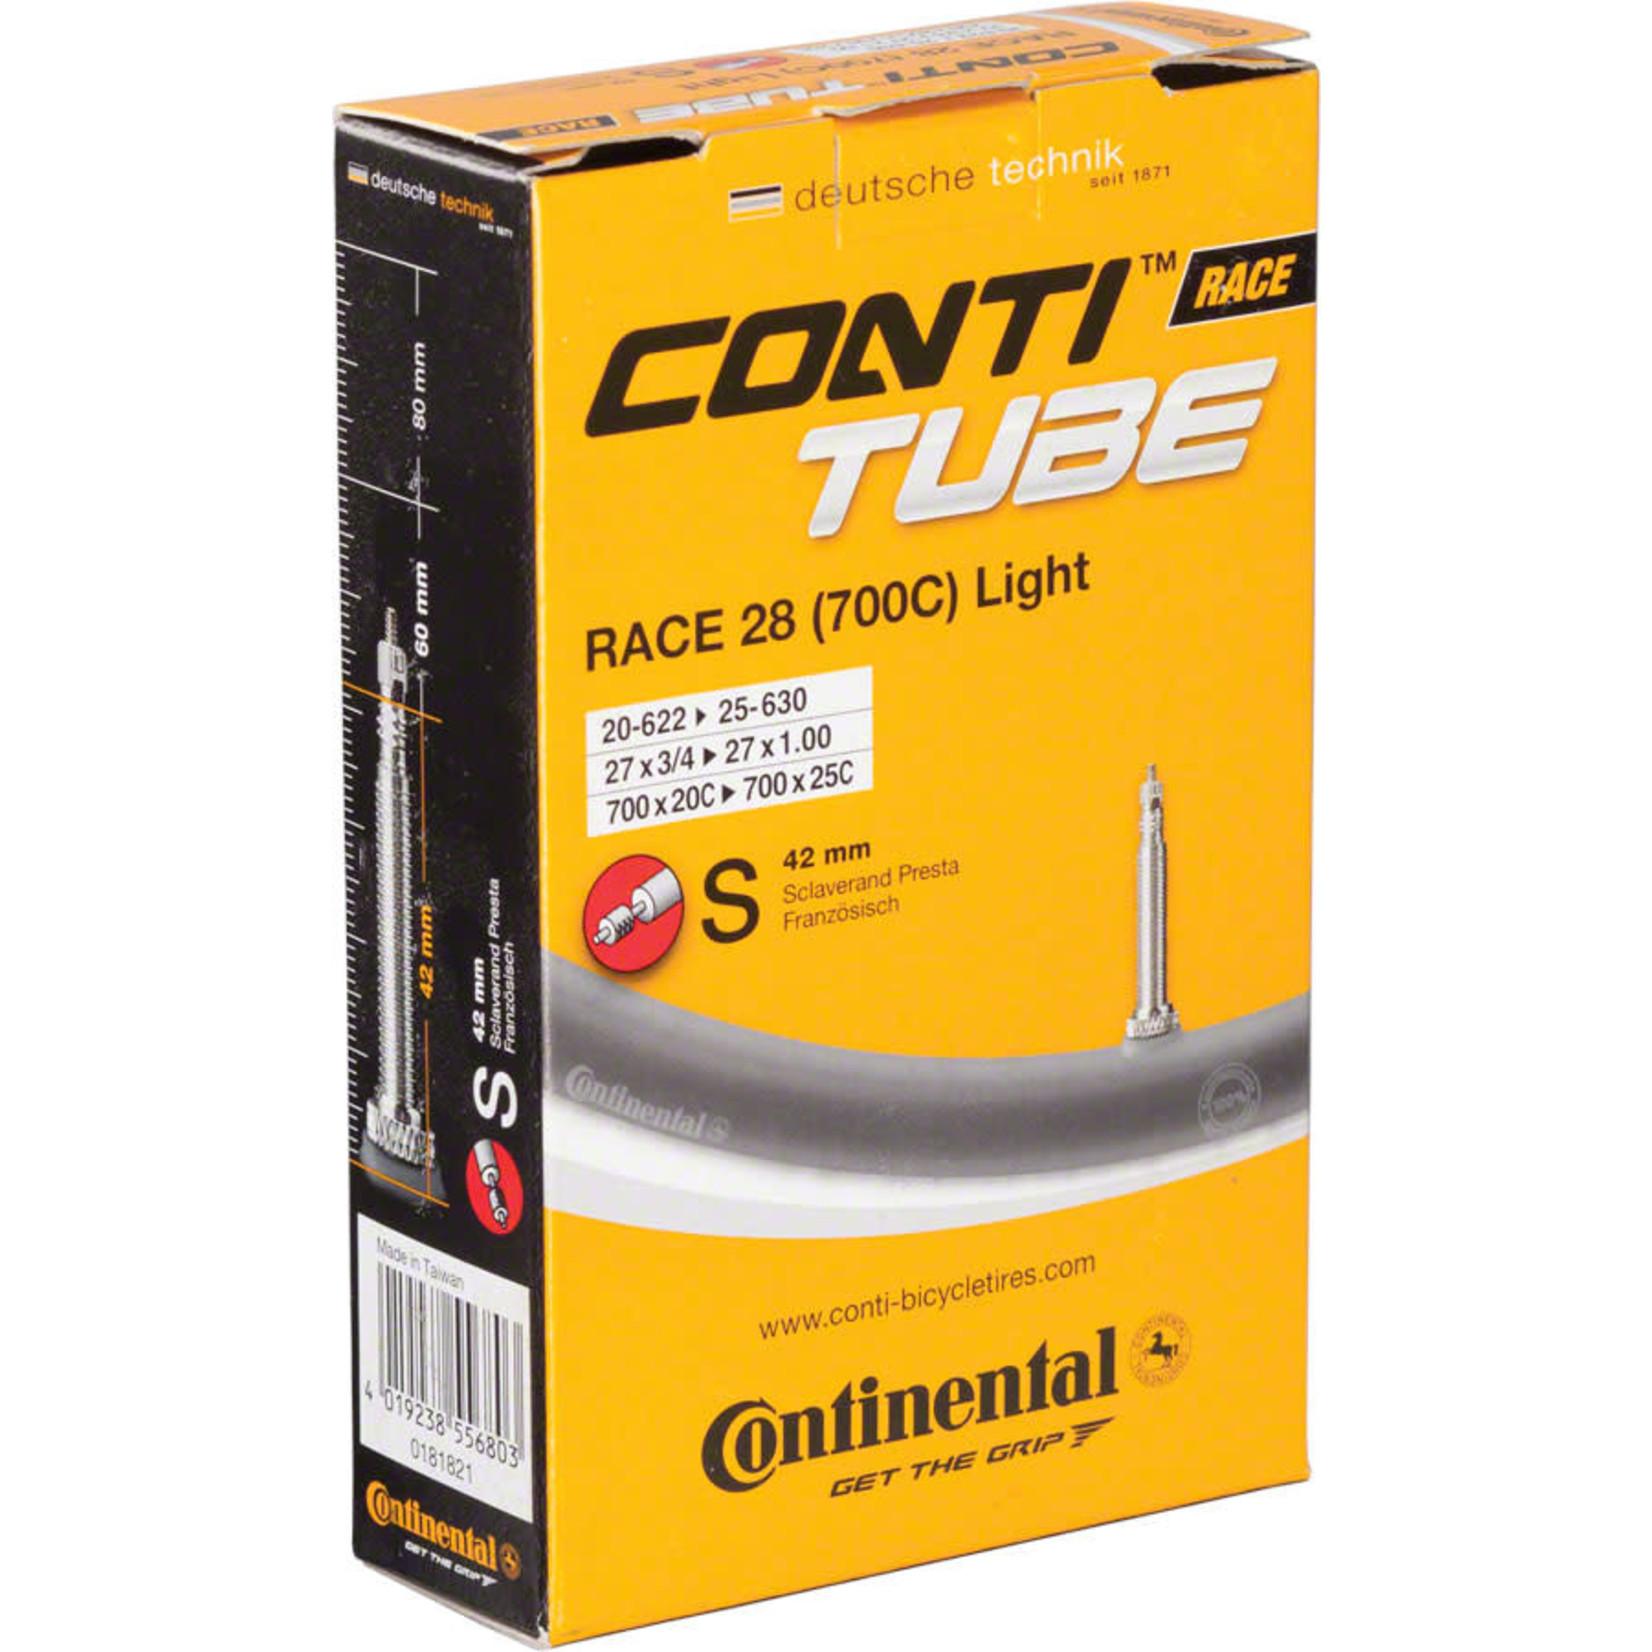 Continental Continental Light 700 x 18-25mm 42mm Presta Valve Tube